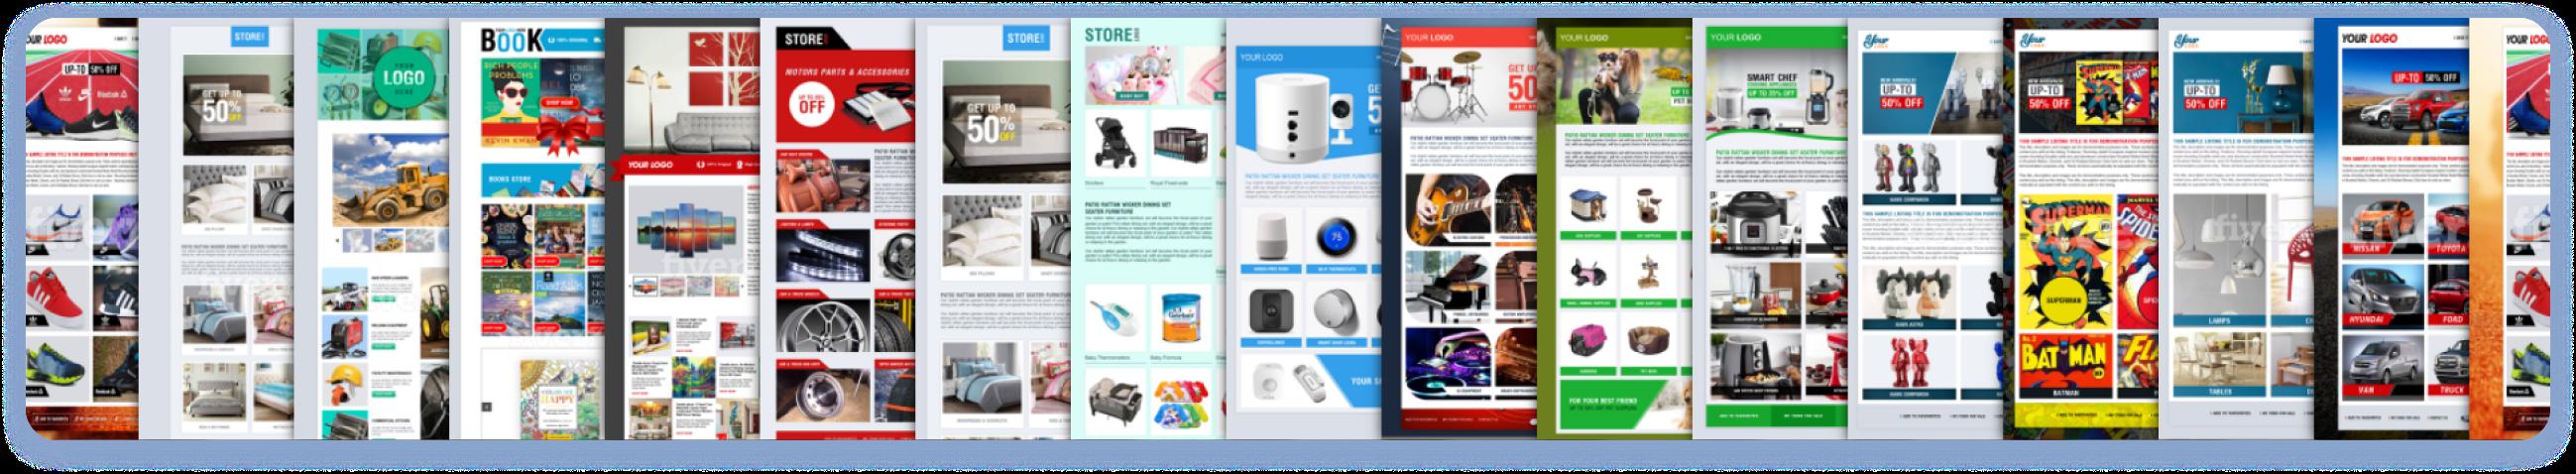 Showcase of many eBay Listing Designer templates built by eBay sellers.